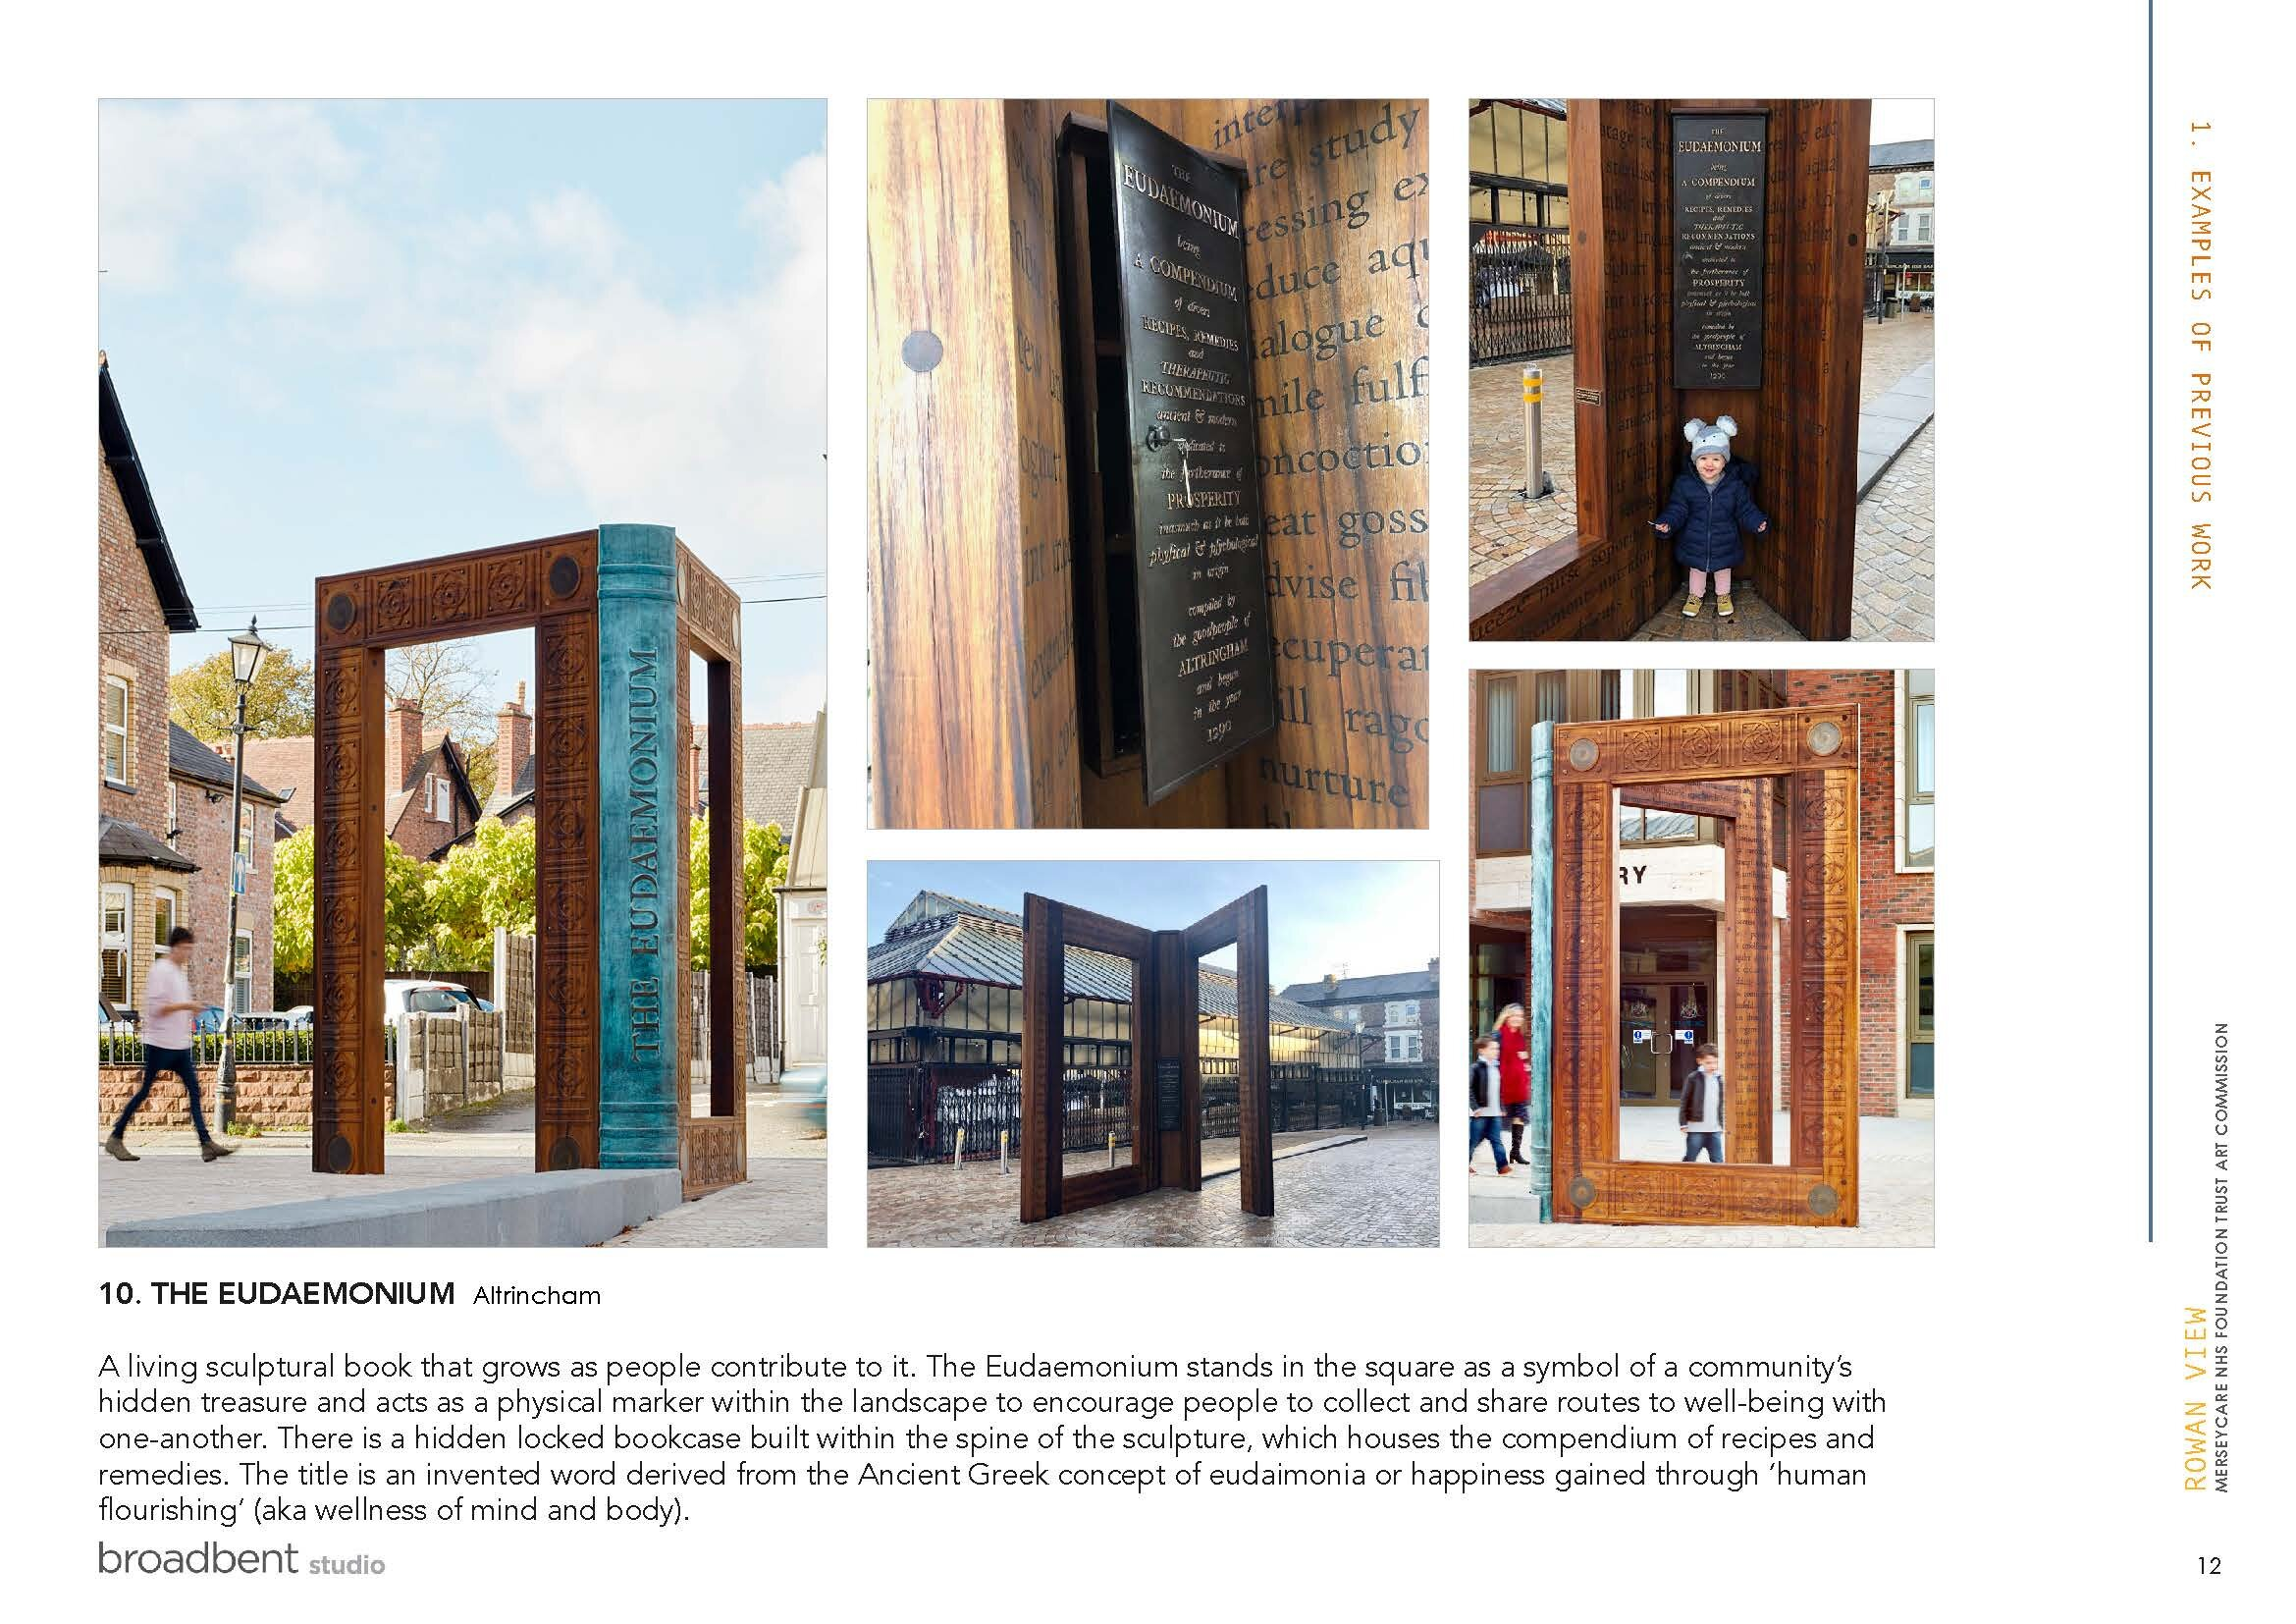 Broadbent Studio - Image 10.jpg